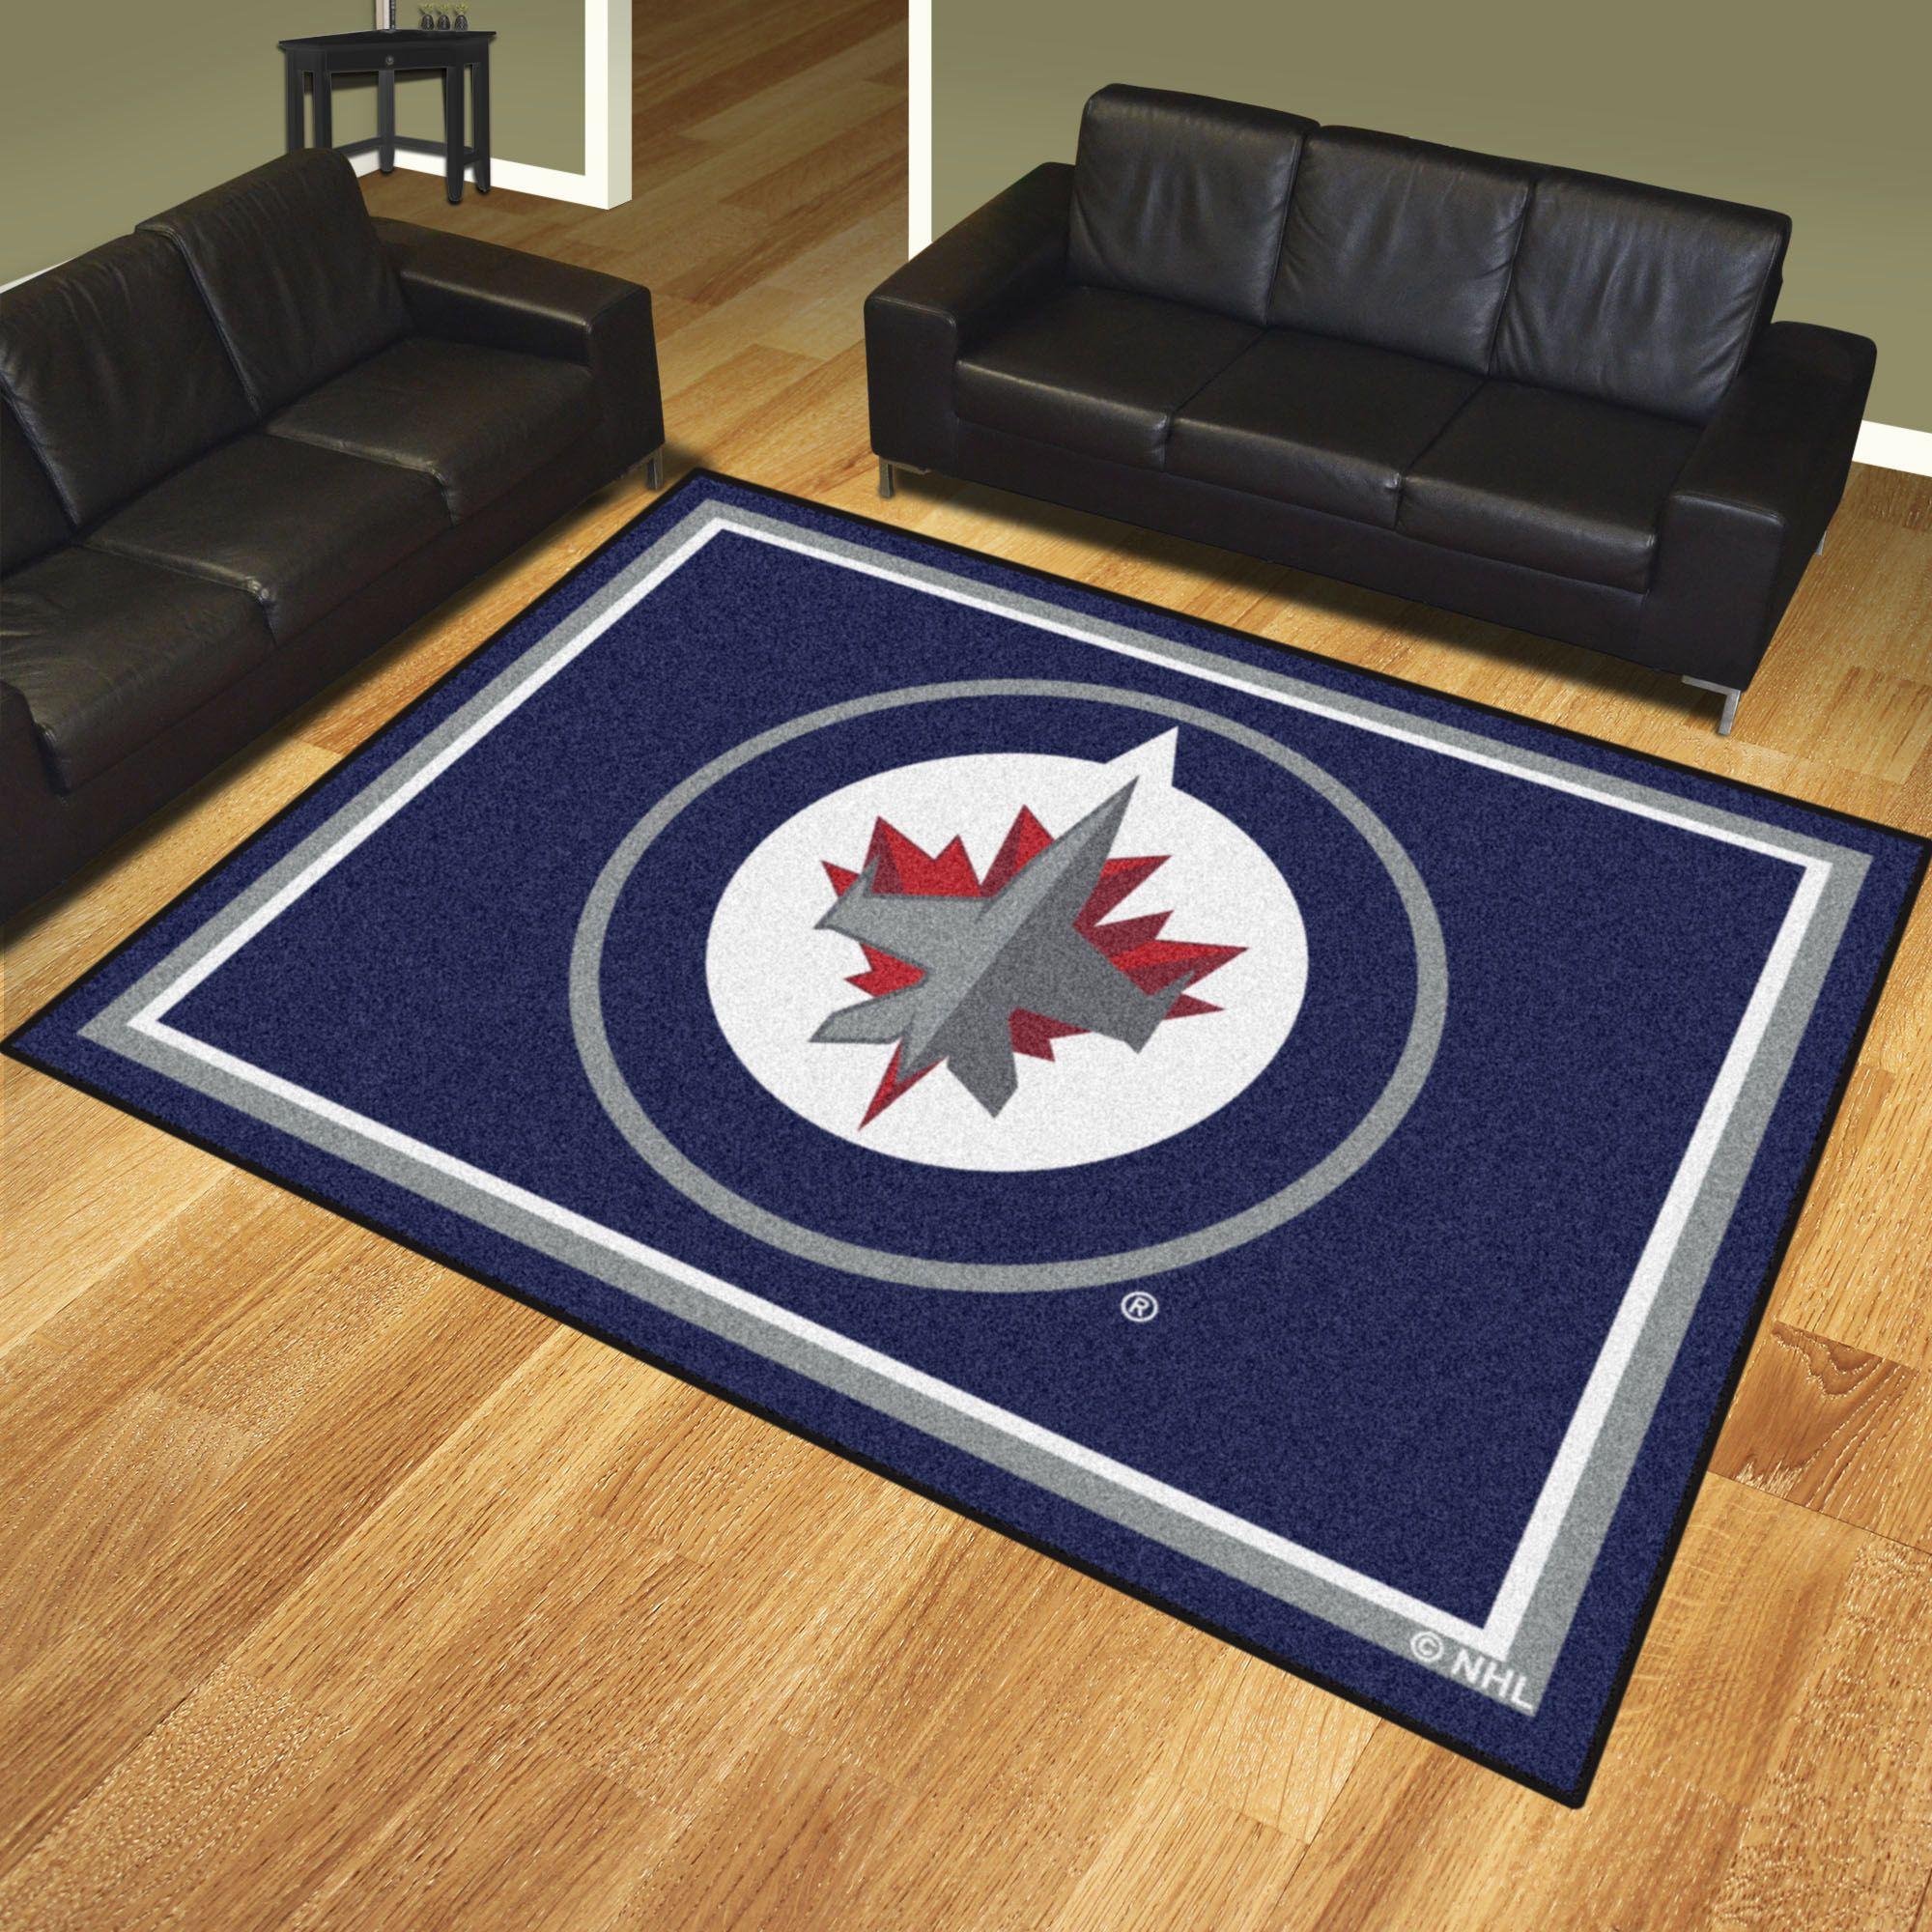 Winnipeg Jets 8x10 Rug Rugs